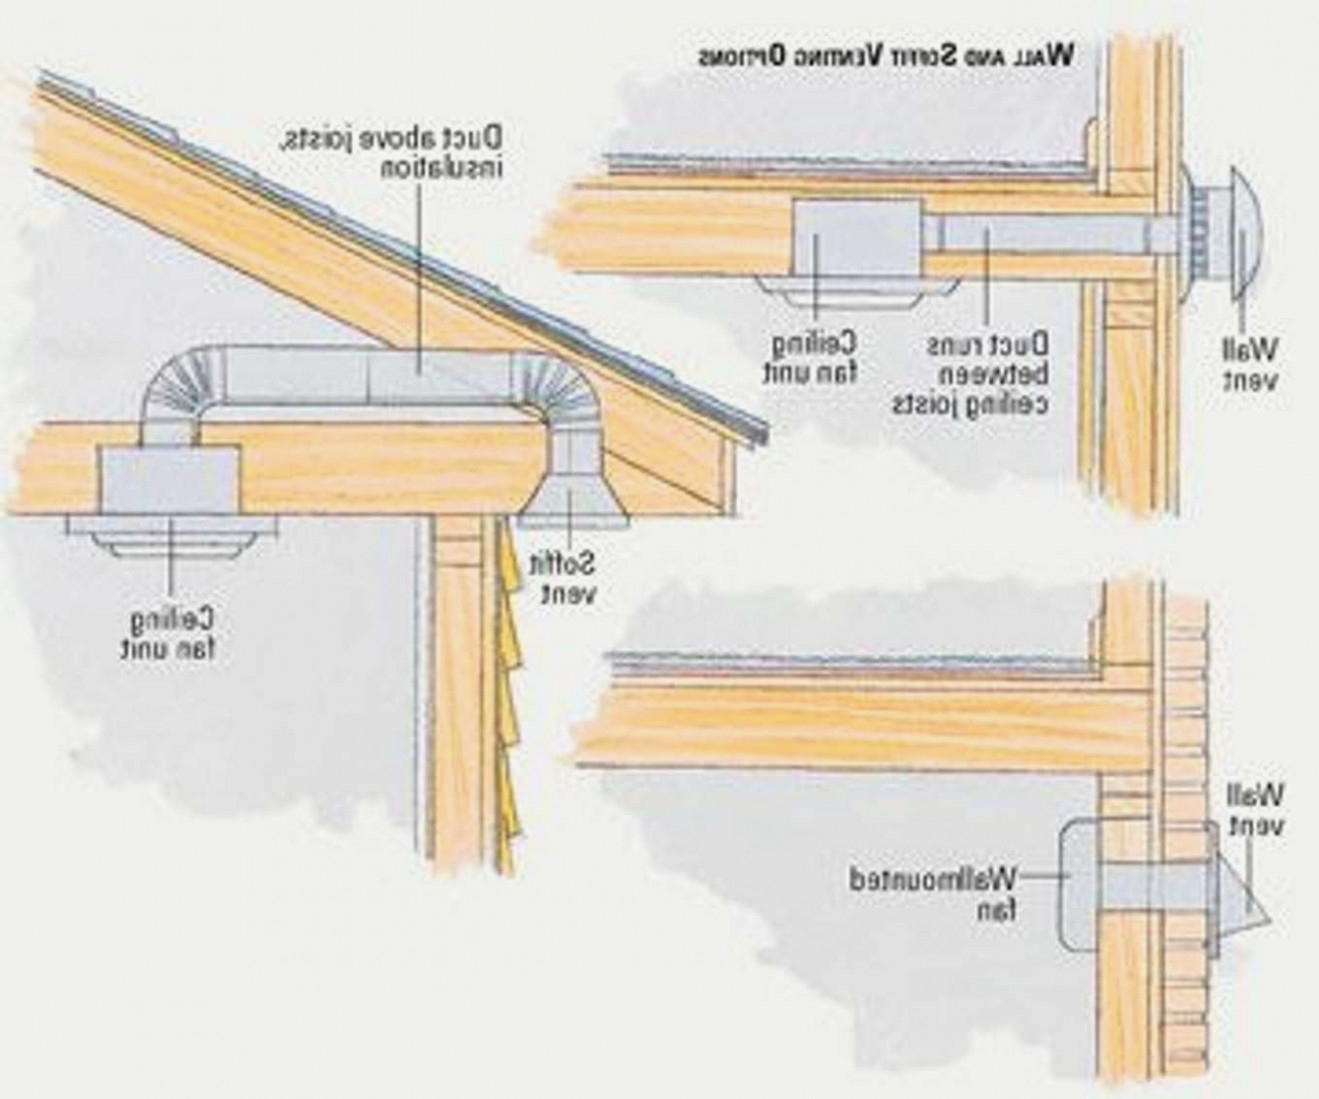 Bathroom Exhaust Fan Venting Outside Via Soffit Exhaust Fans in measurements 1319 X 1099